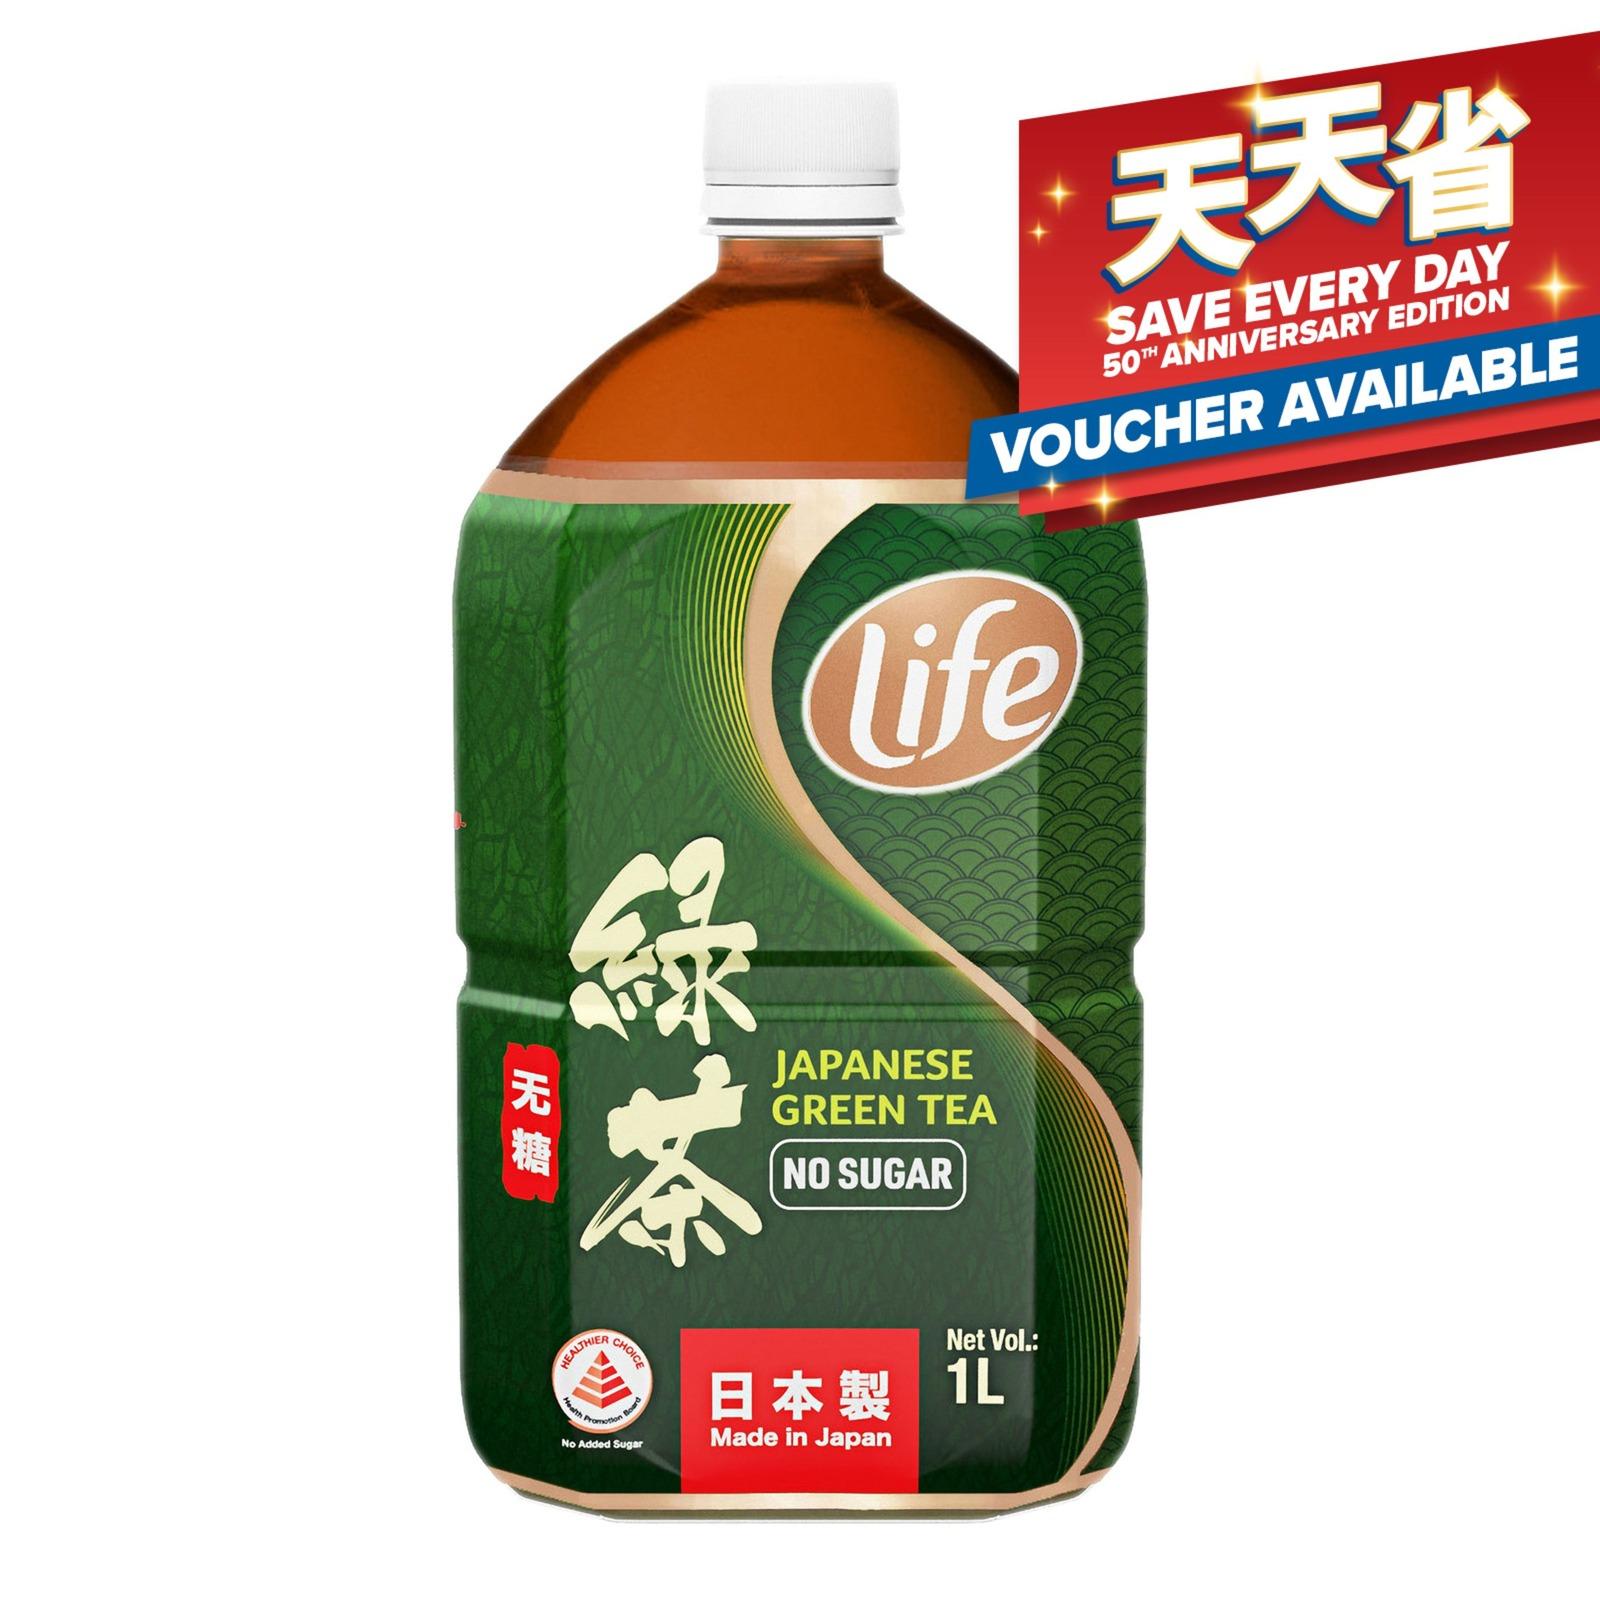 Life Japanese Green Tea Bottle Drink - No Sugar